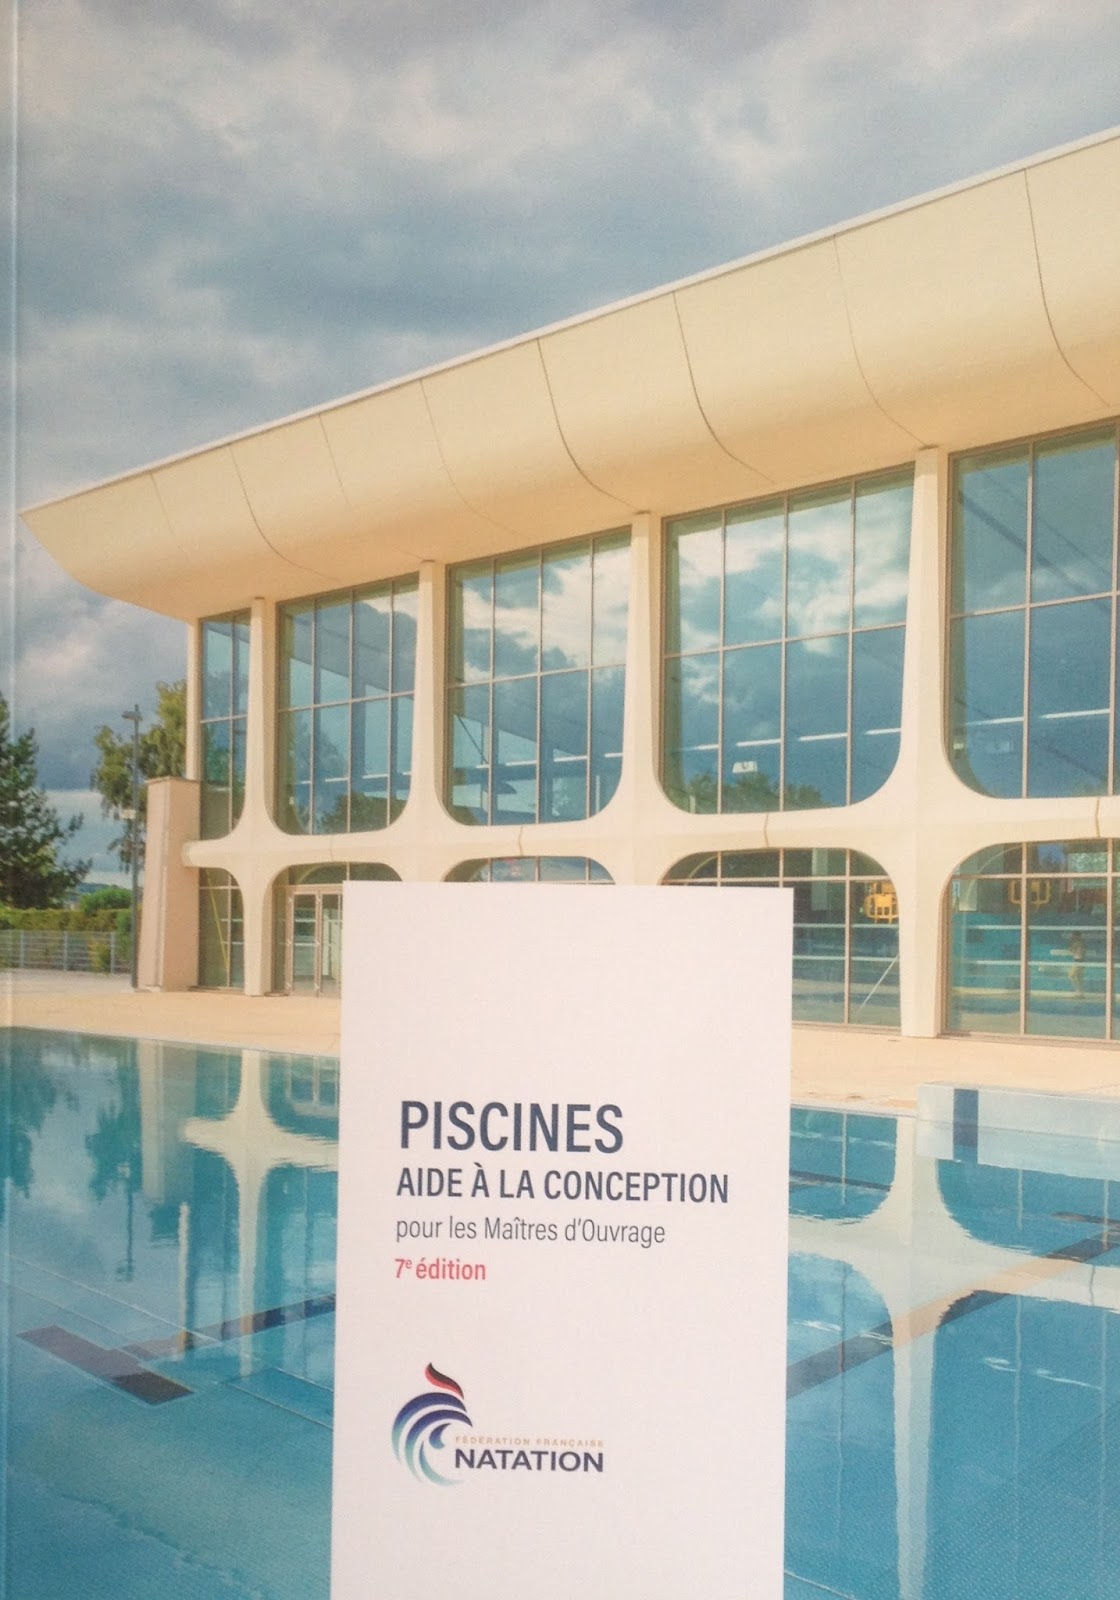 Gestion du risque de noyade en piscine publique for Conception piscine publique